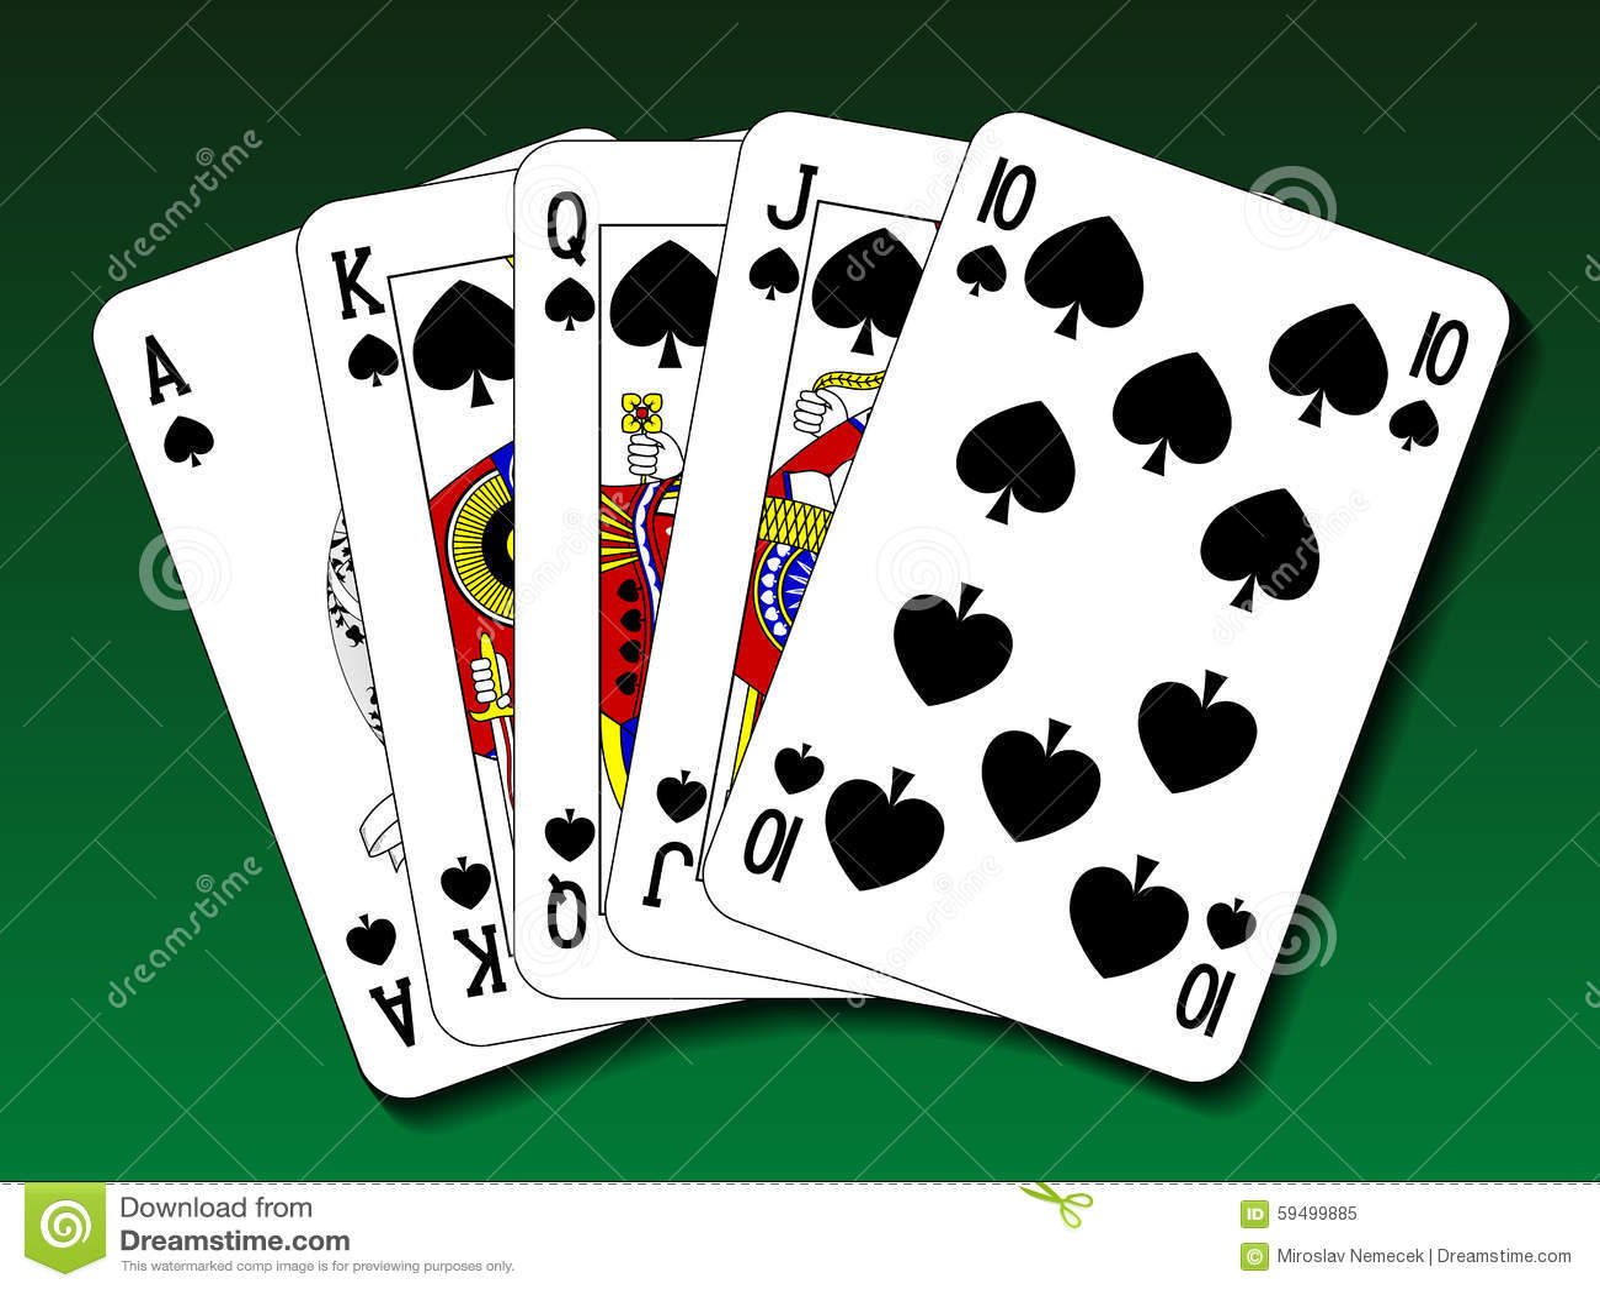 Poker quinte royale minijuegos de poker gratis gobernador del poker